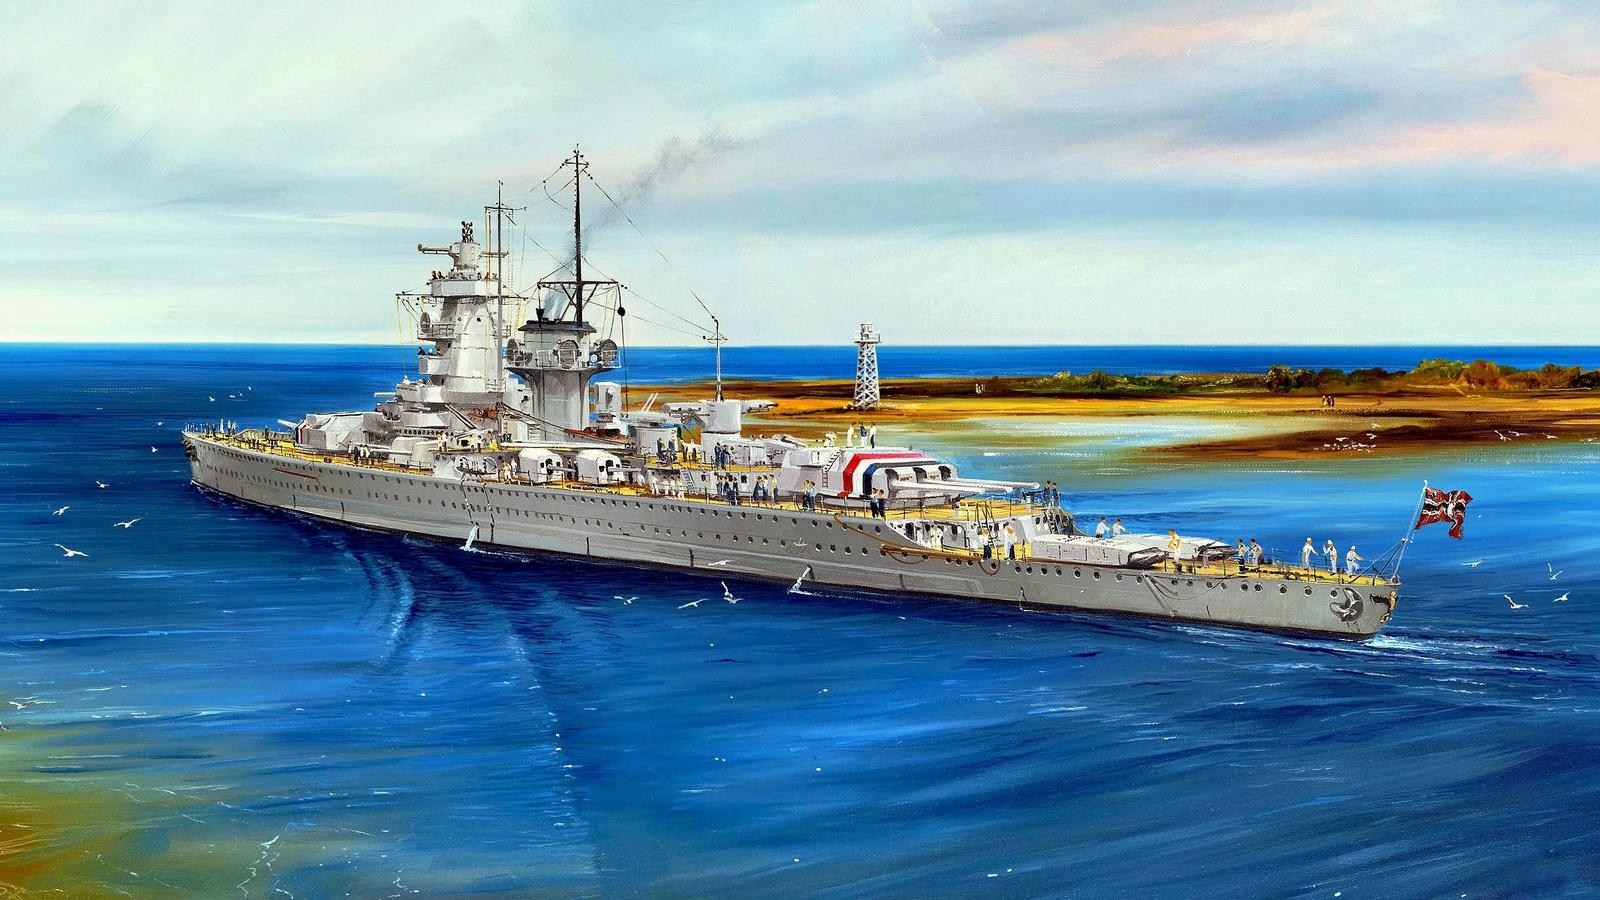 море, адмирал граф шпее, война